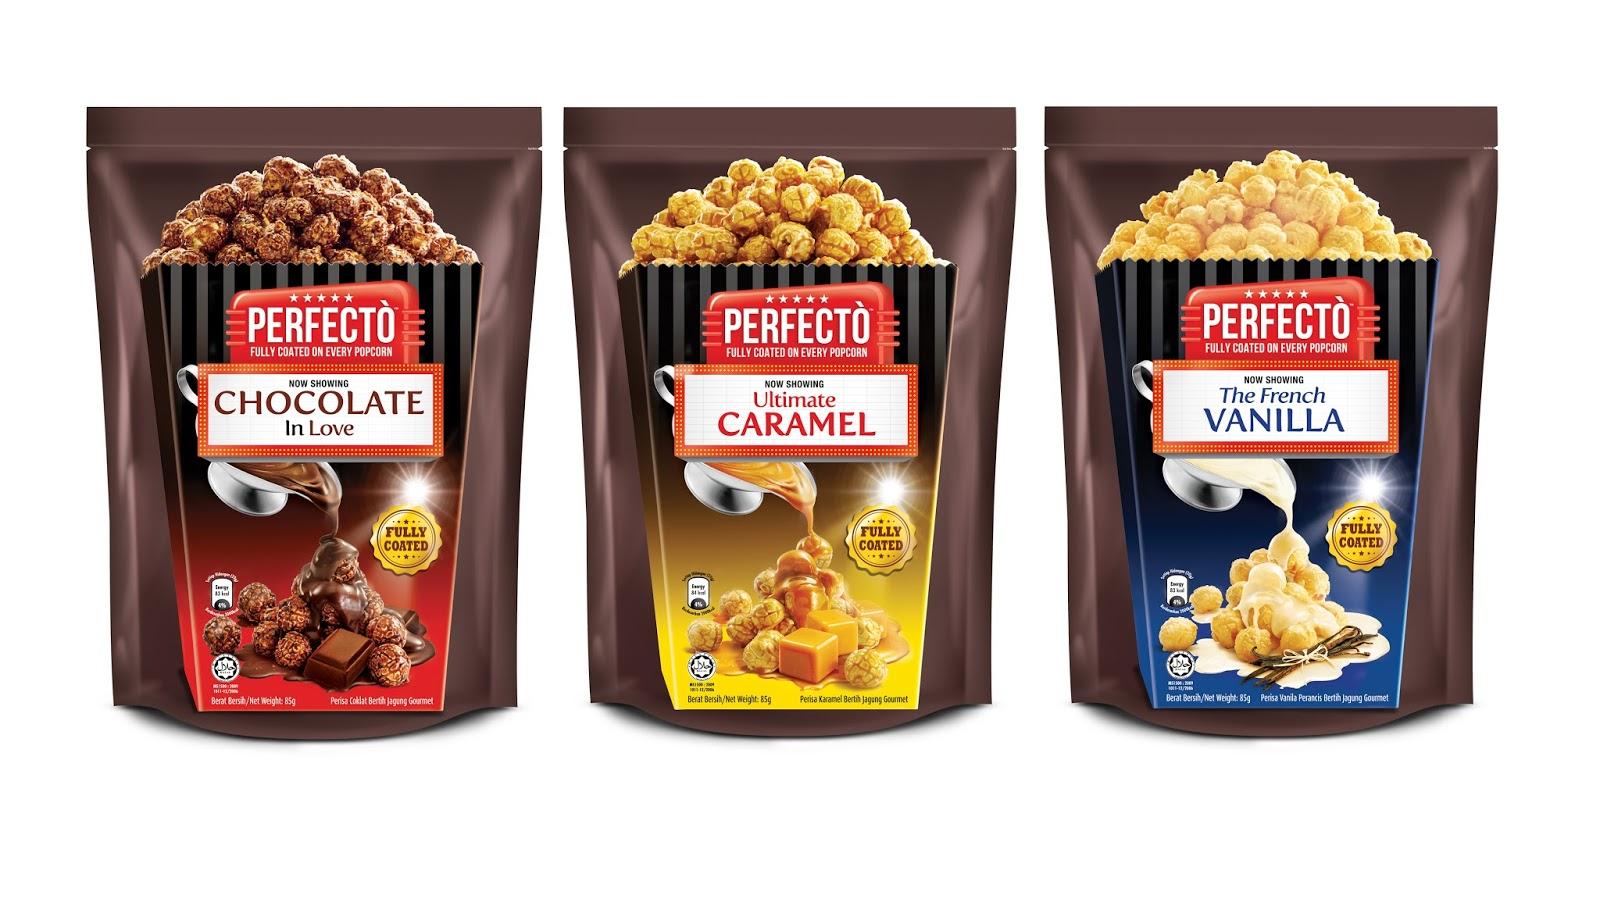 perfecto-popcorn-launch-2015-nuffnangcpuv